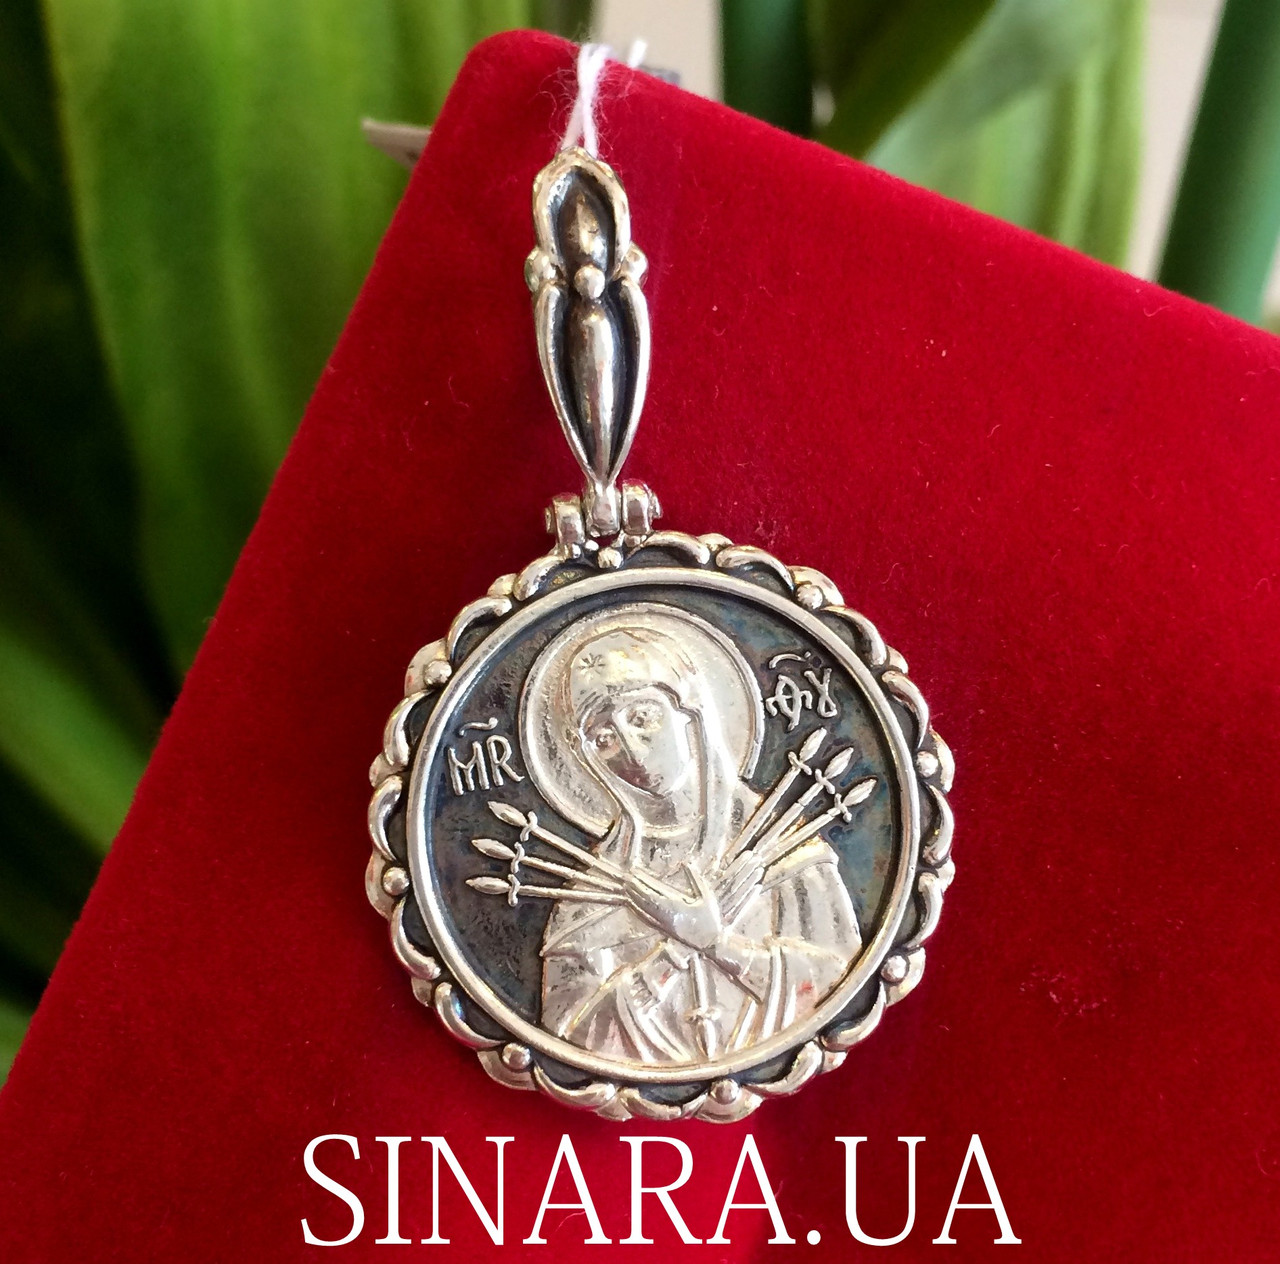 Серебряная ладанка Семистрельная - Иконка Семистрельная Богородица